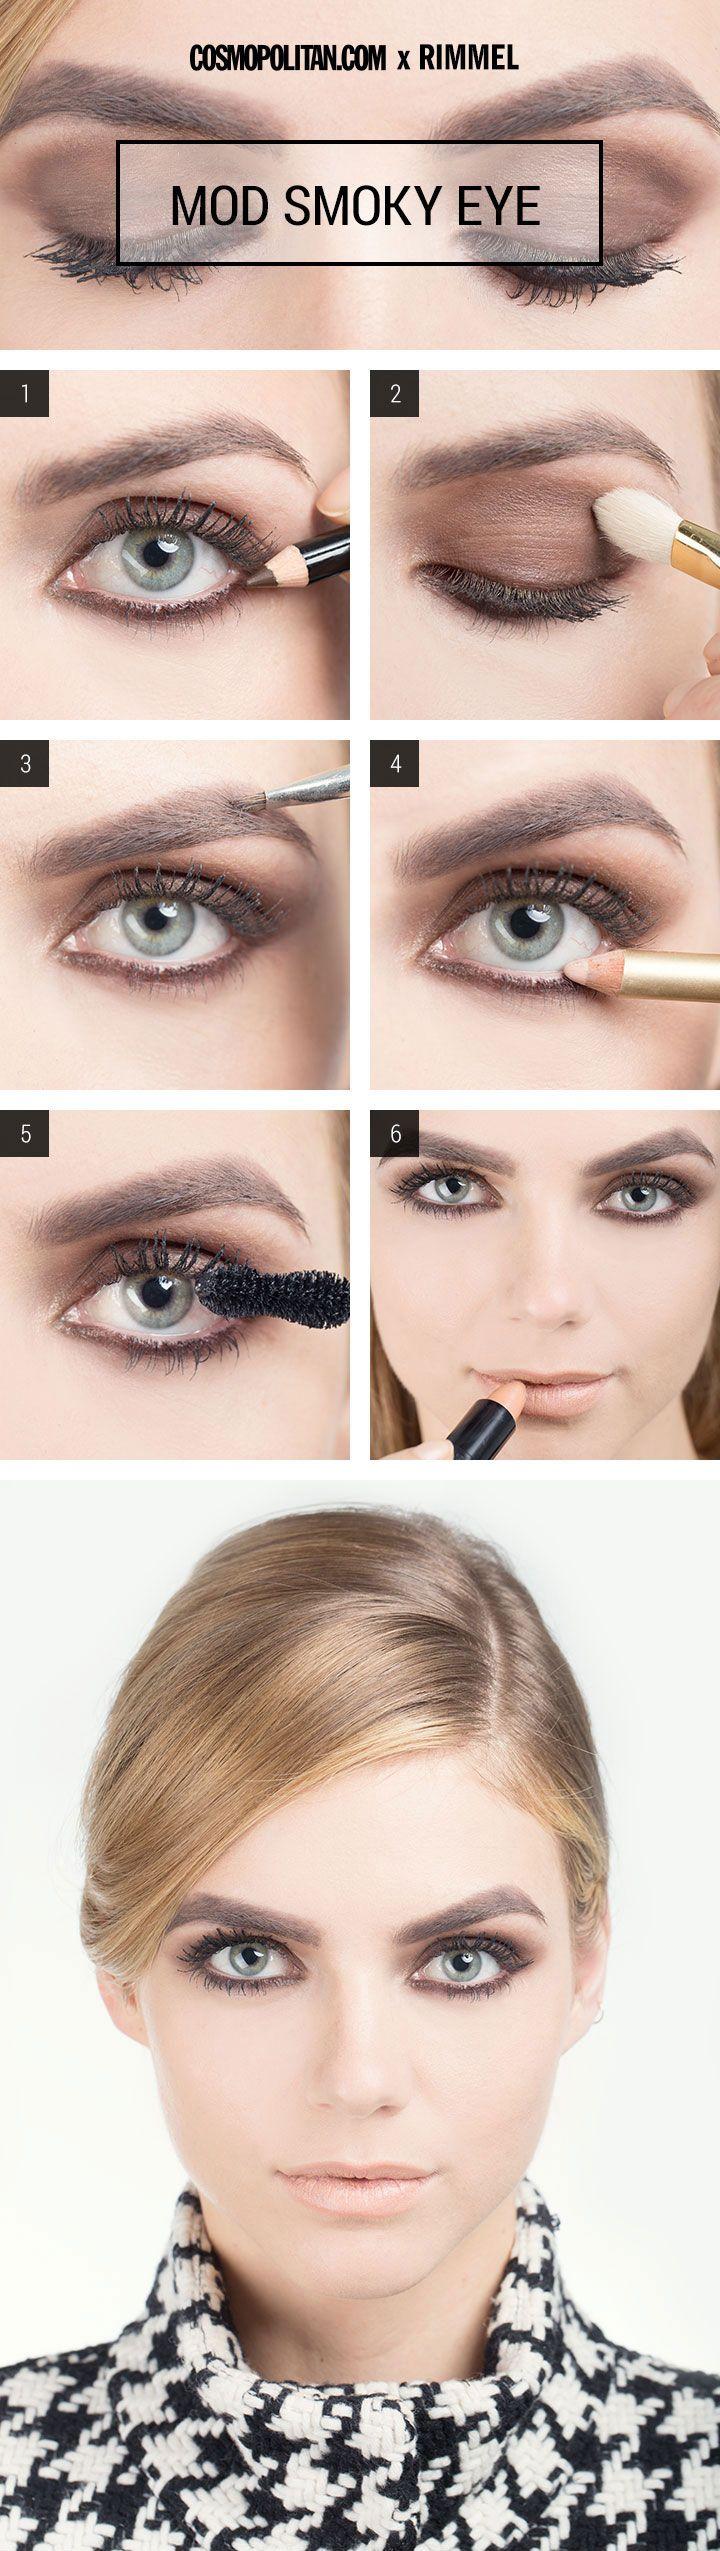 Mod Eye Makeup Look – Mod Smoky Eye Makeup Tutorial - Cosmopolitan